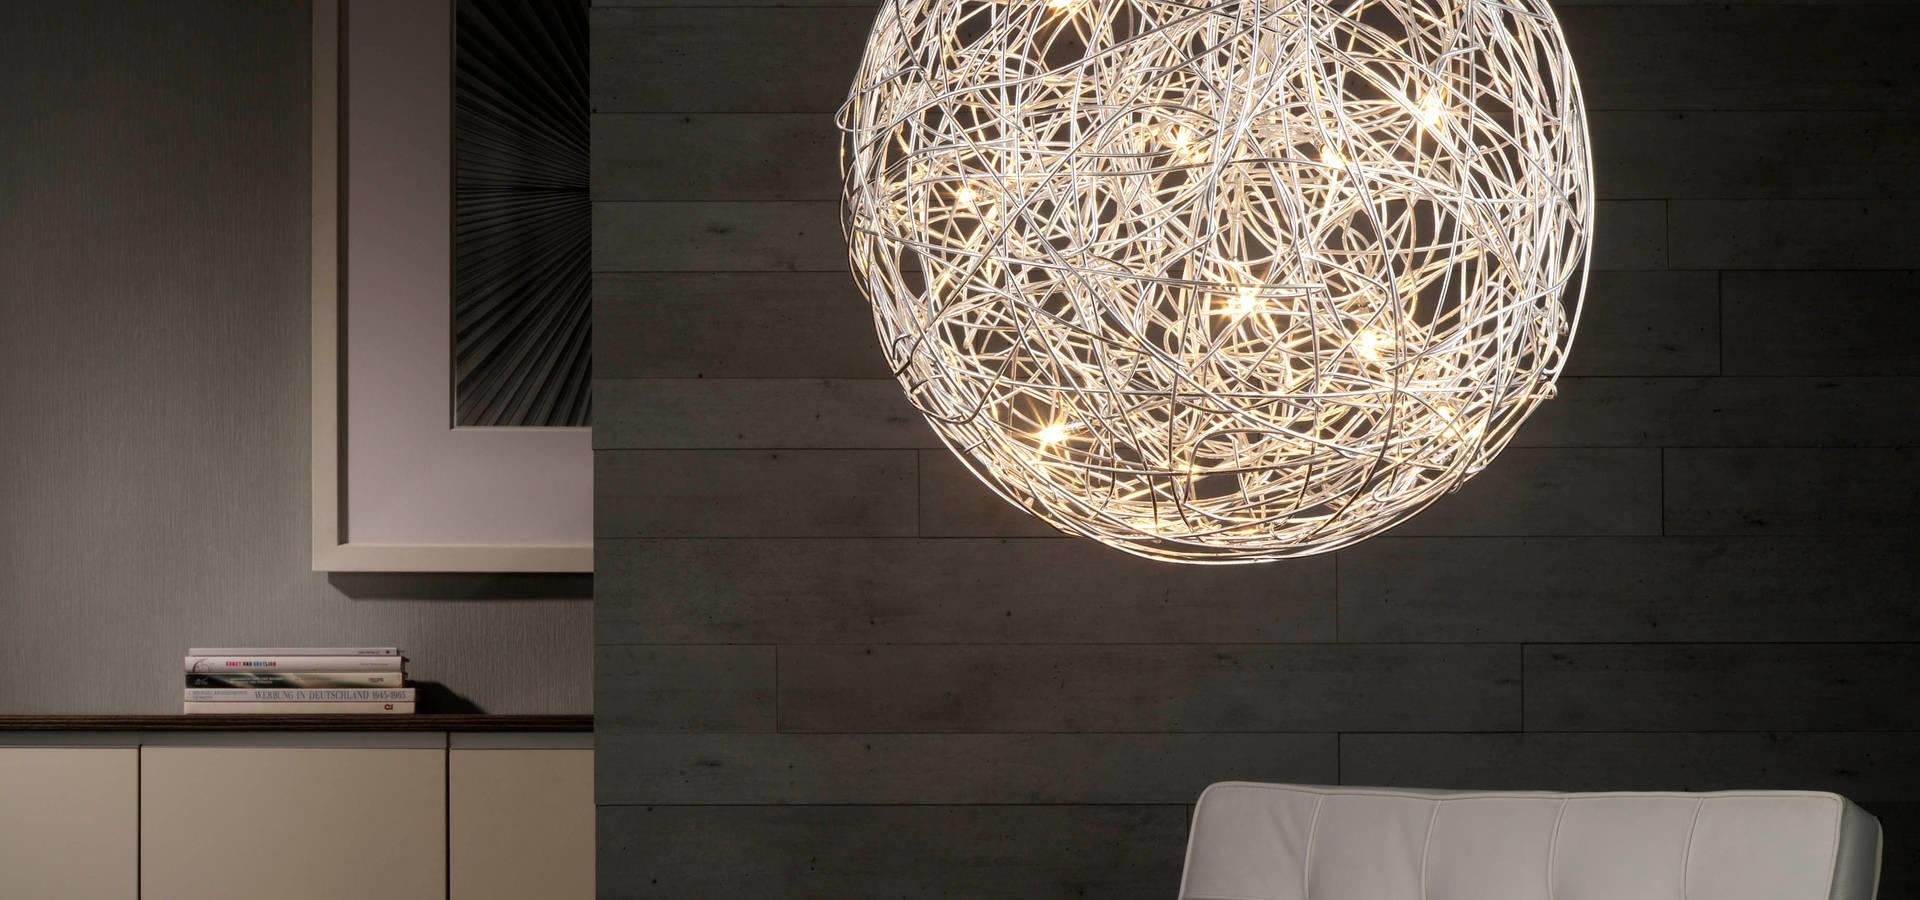 click gmbh co kg lighting in recklinghausen homify. Black Bedroom Furniture Sets. Home Design Ideas